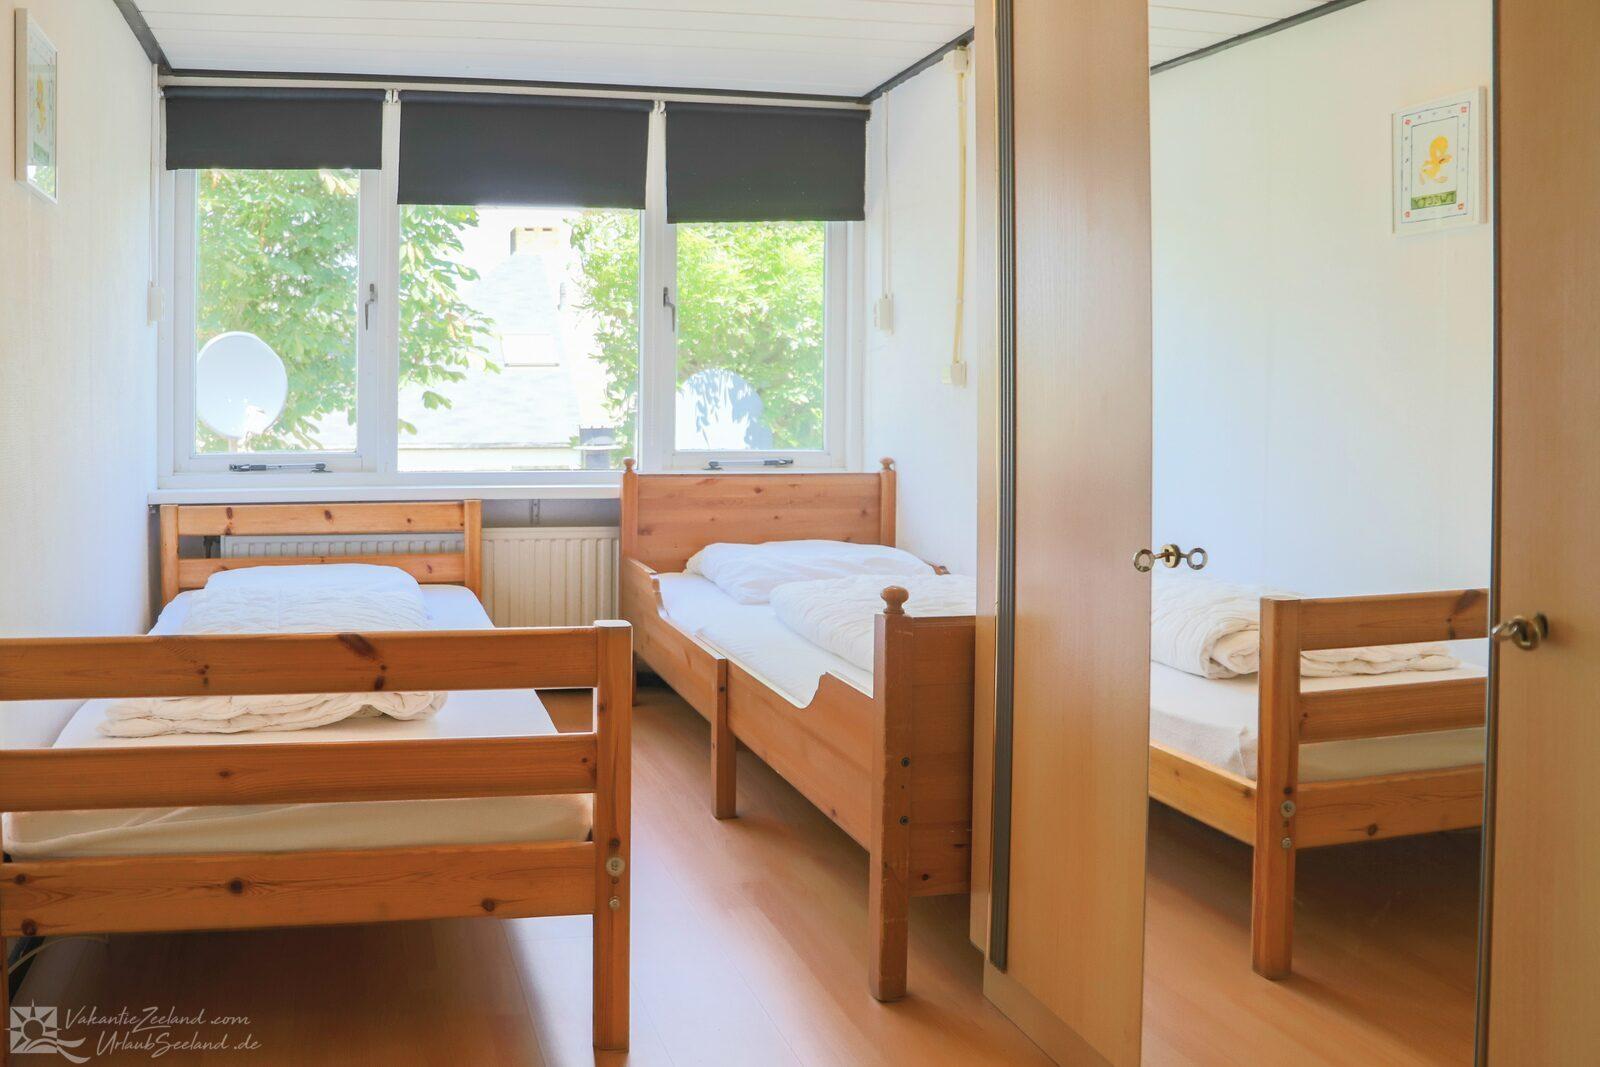 VZ619 Vakantiehuis Stavenisse